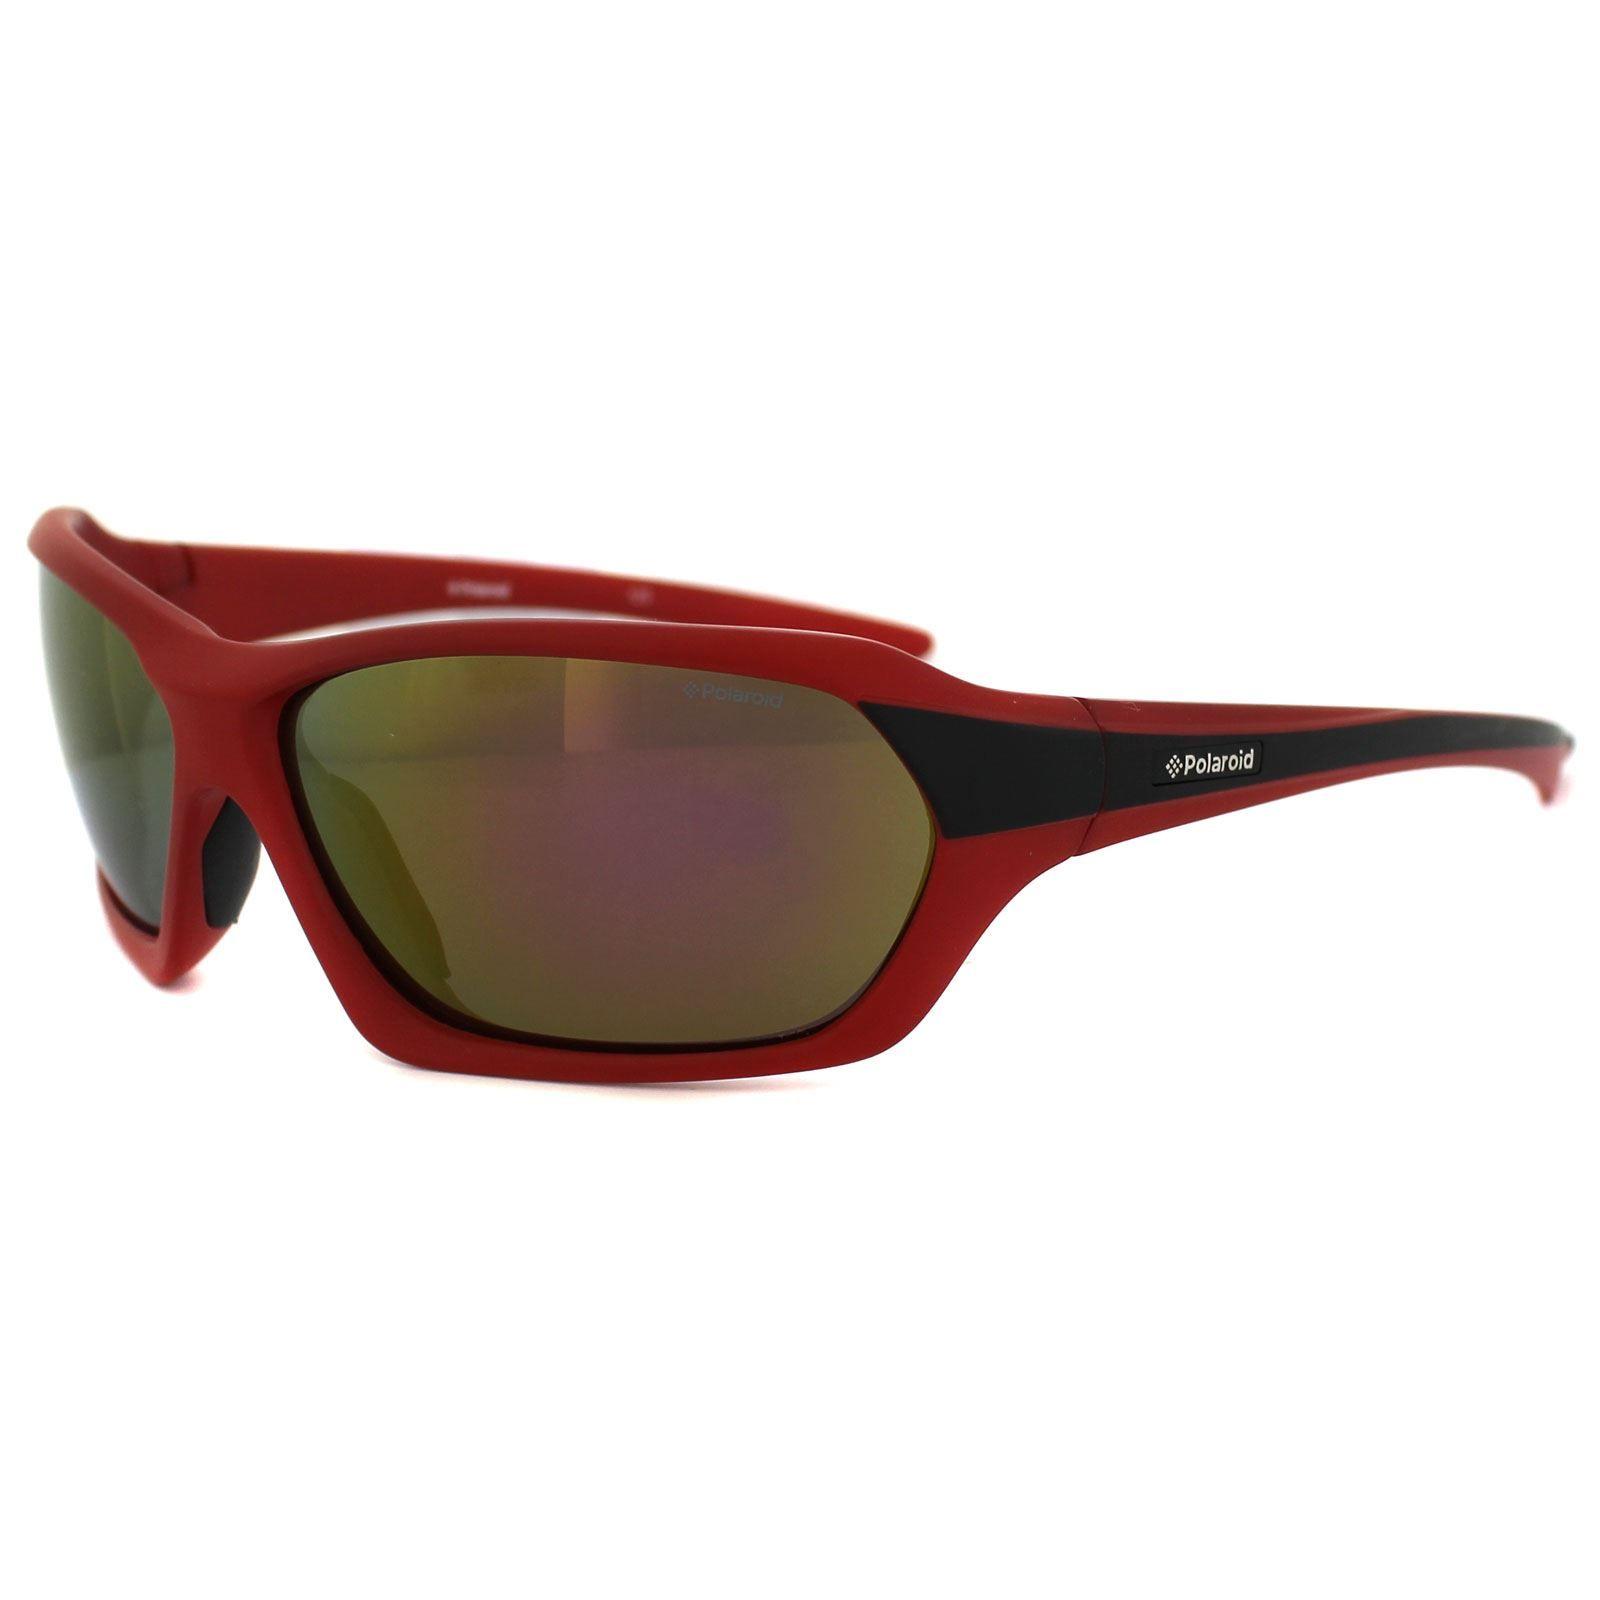 Polaroid Sport Sunglasses P7402 0A4 JB Red & Black Yellow Red Polarized